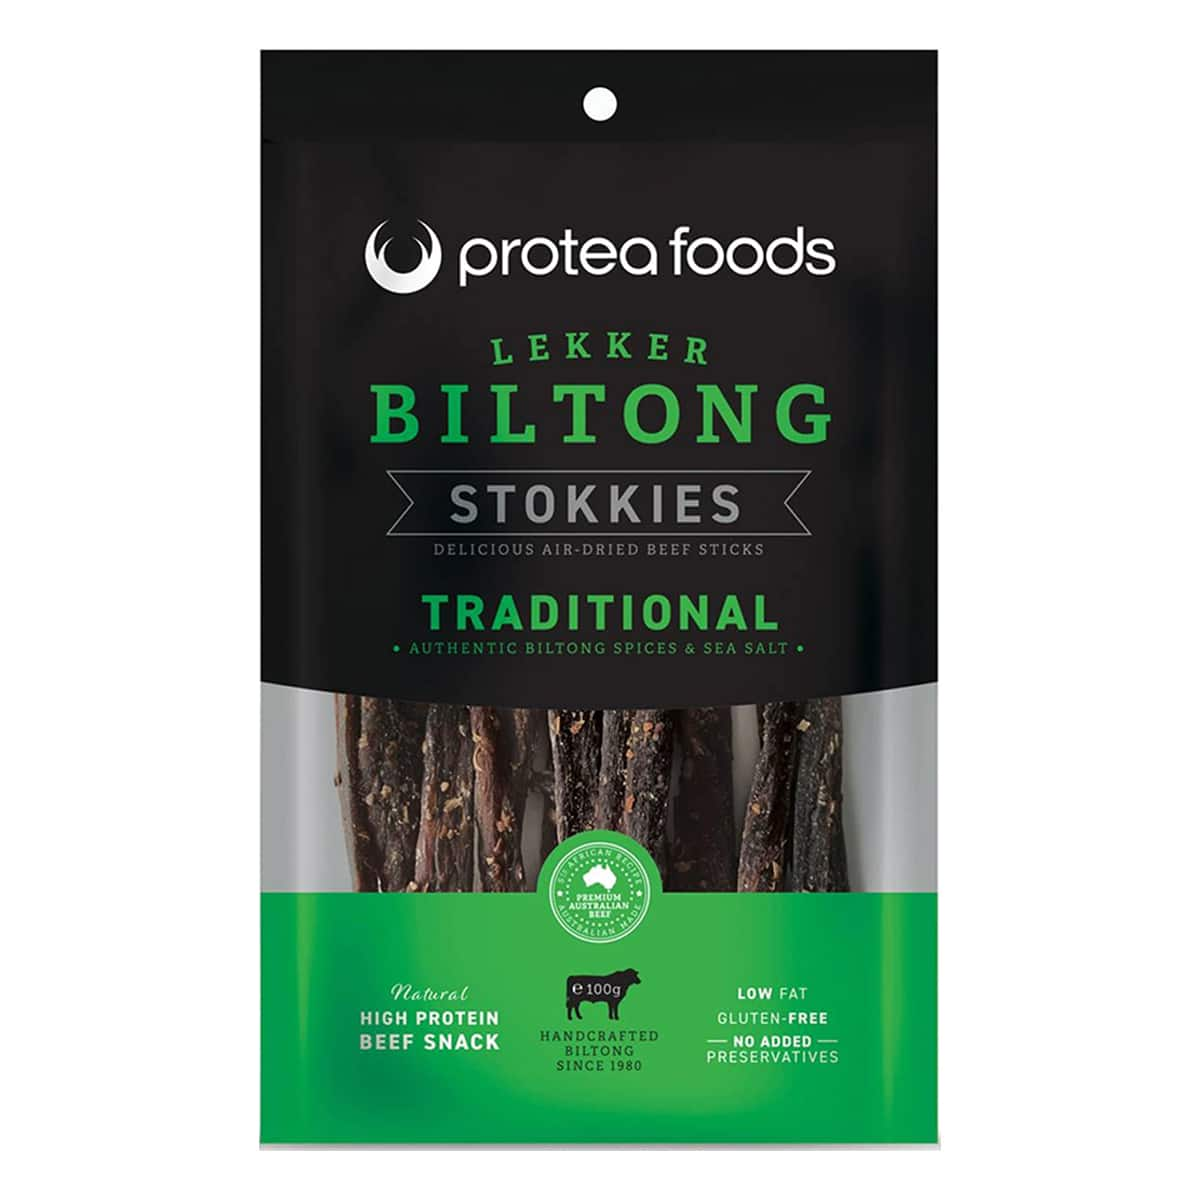 Buy Protea Foods Lekker Biltong Stokkies Traditional - 100 gm